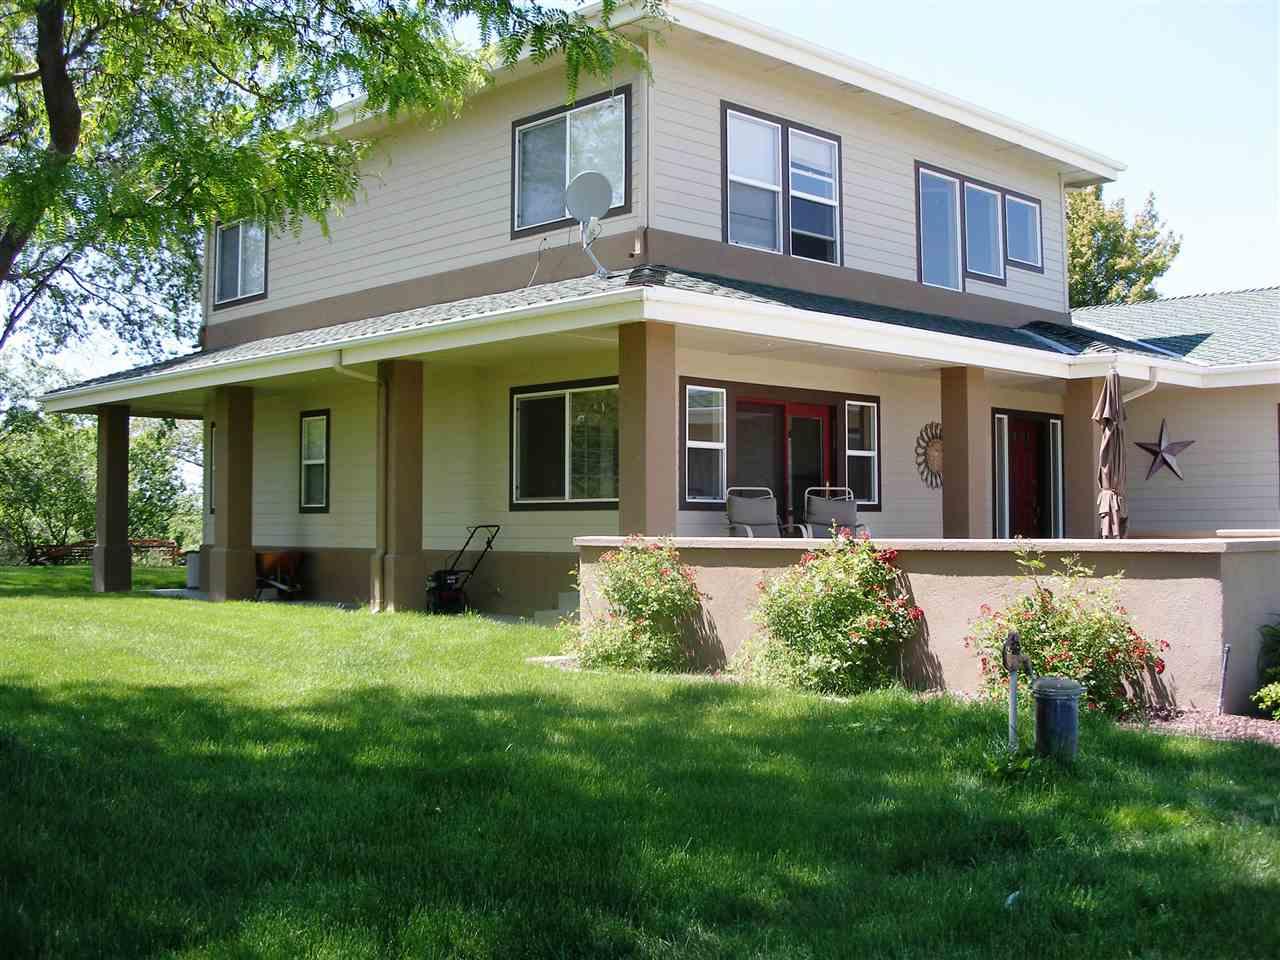 Single Family Home for Sale at 9995 Upper Avenue Emmett, Idaho 83617